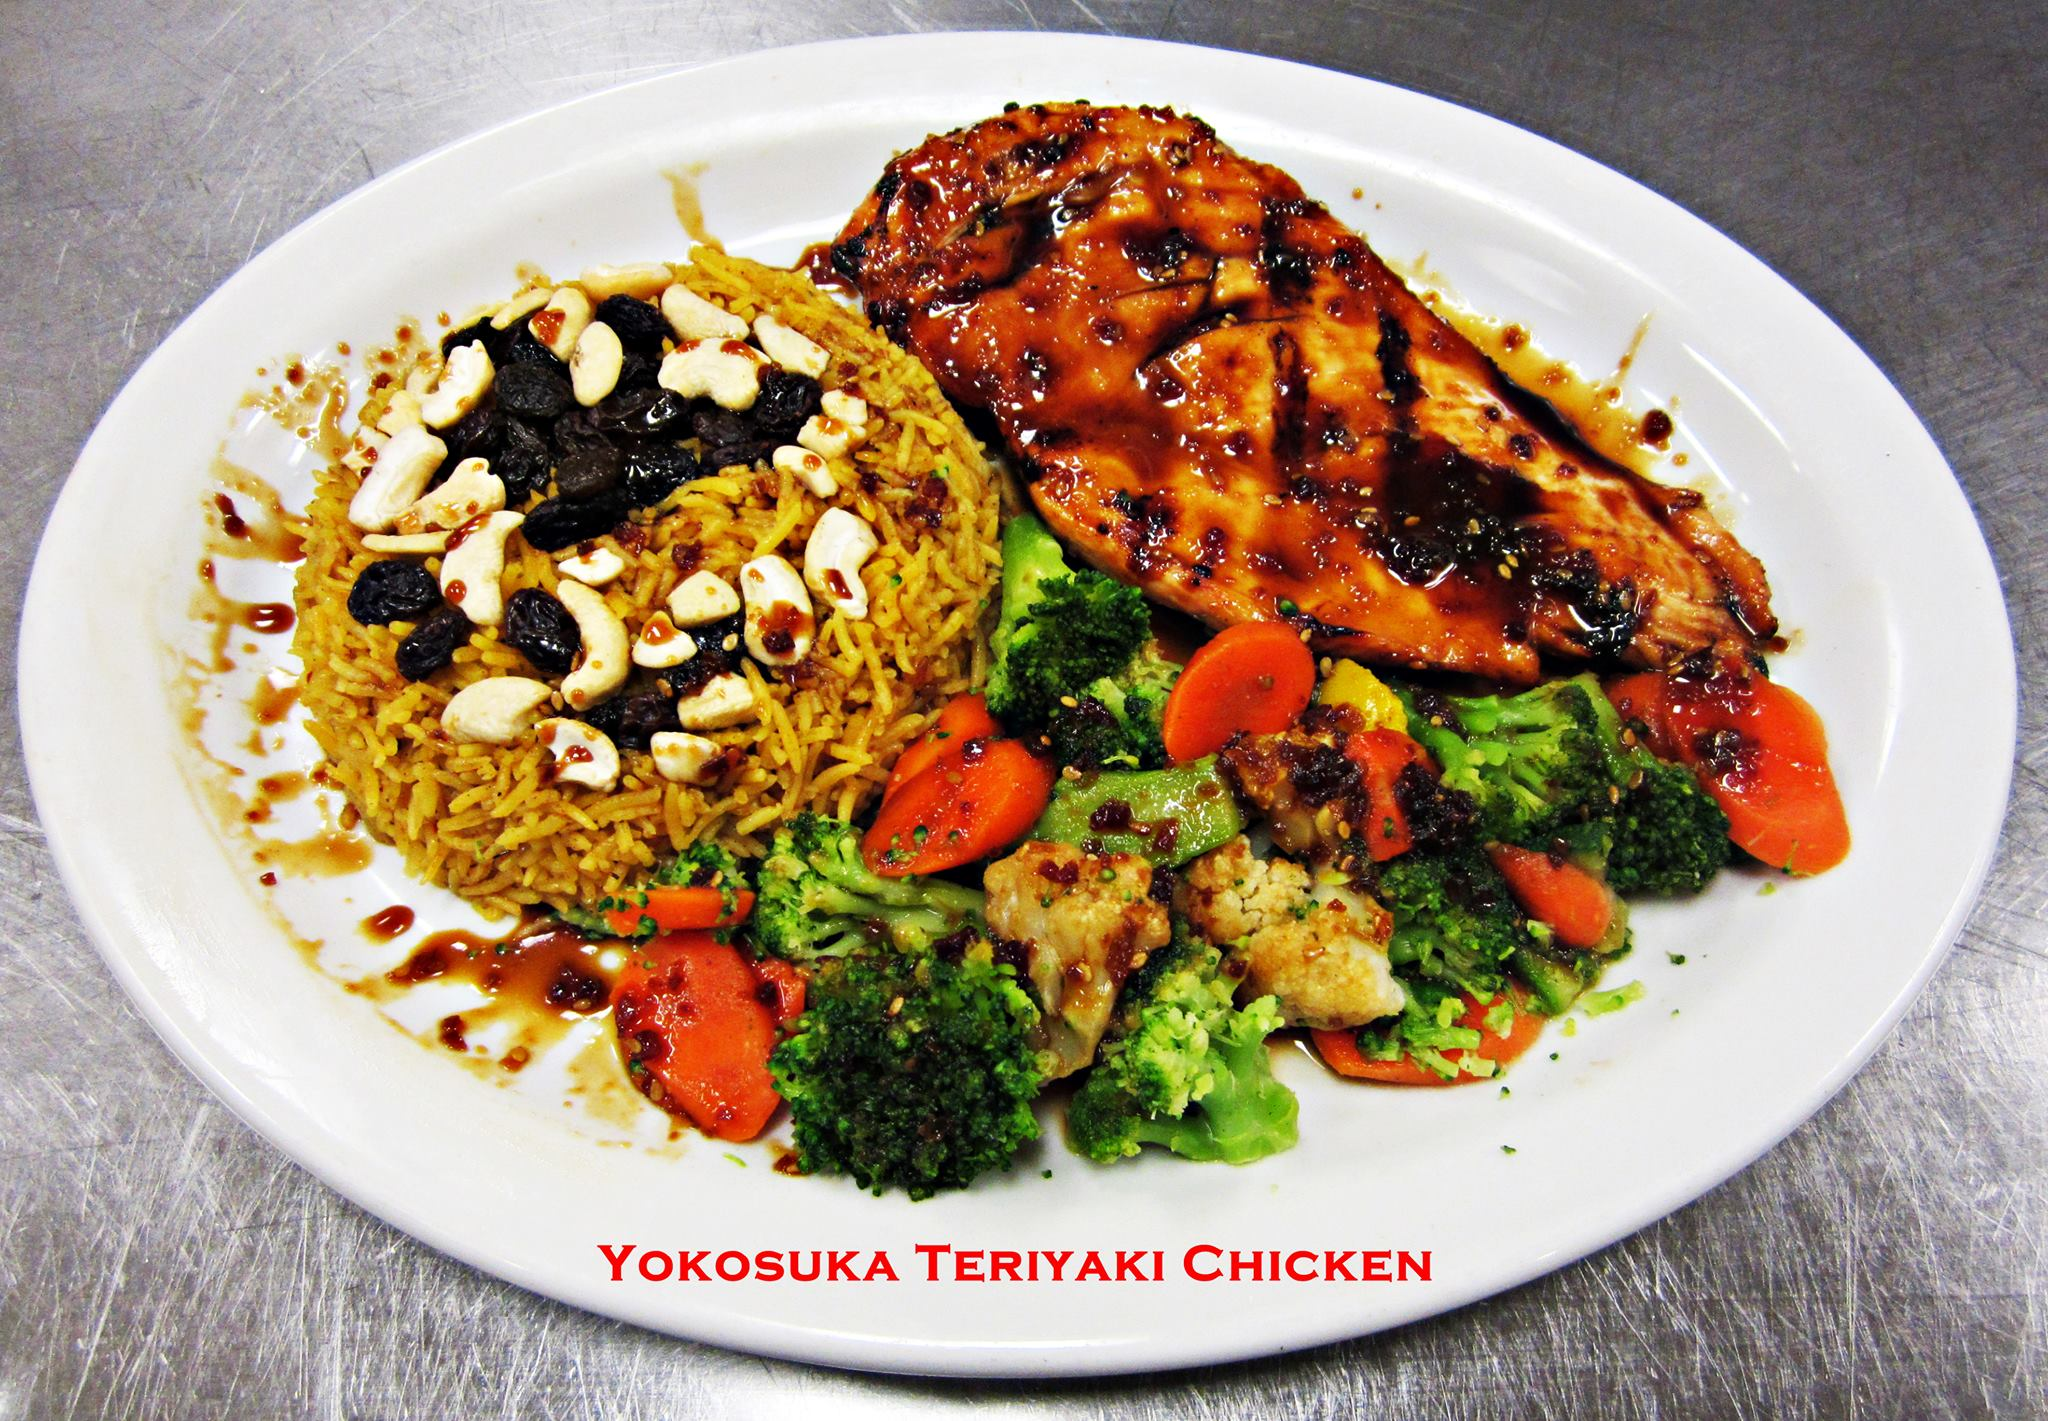 Yokosuka Teriyaki Chicken